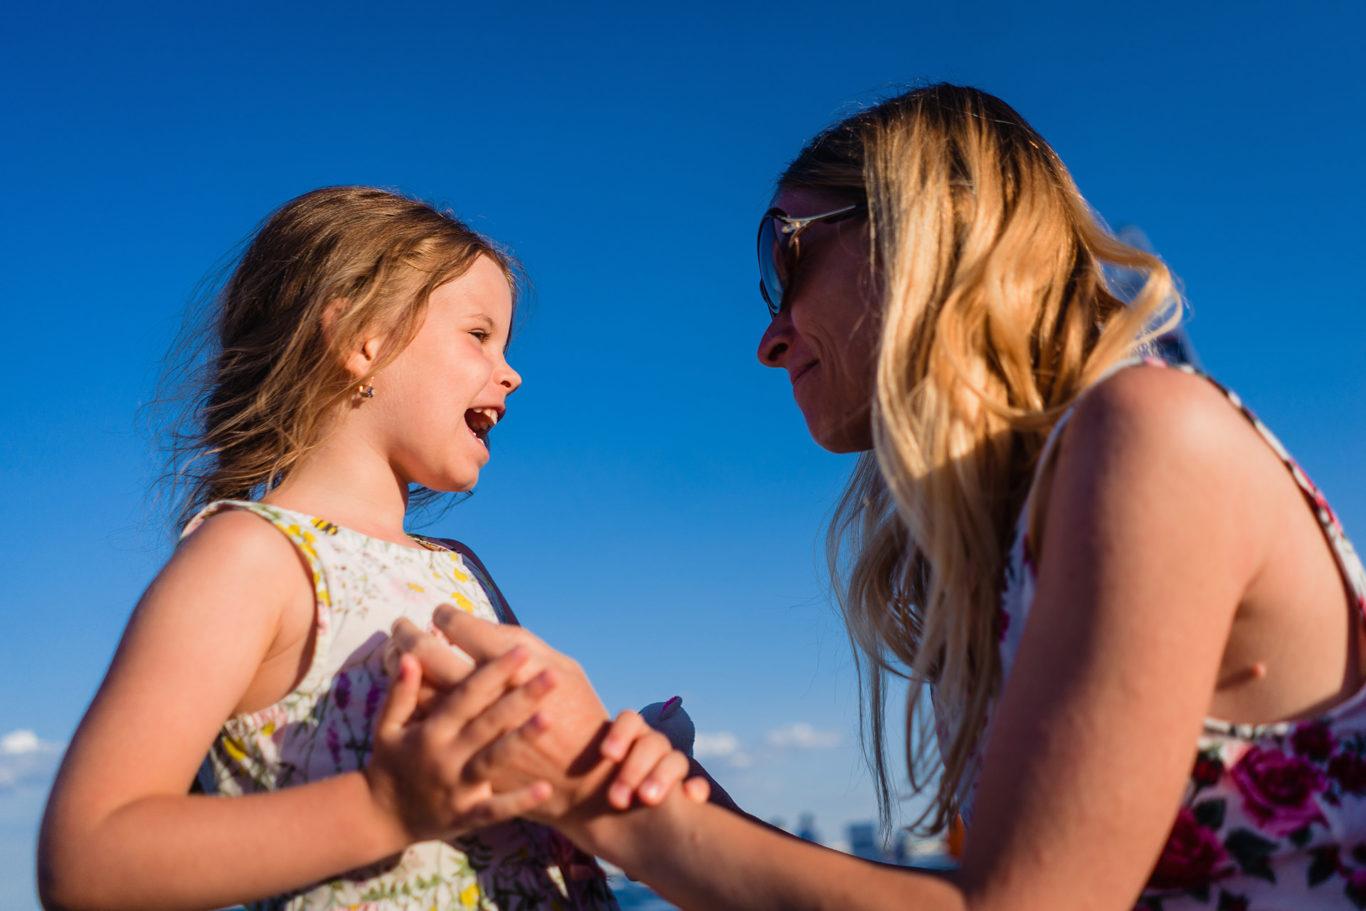 Bucurie sincera de copil - fotograf de familie Ciprian Dumitrescu